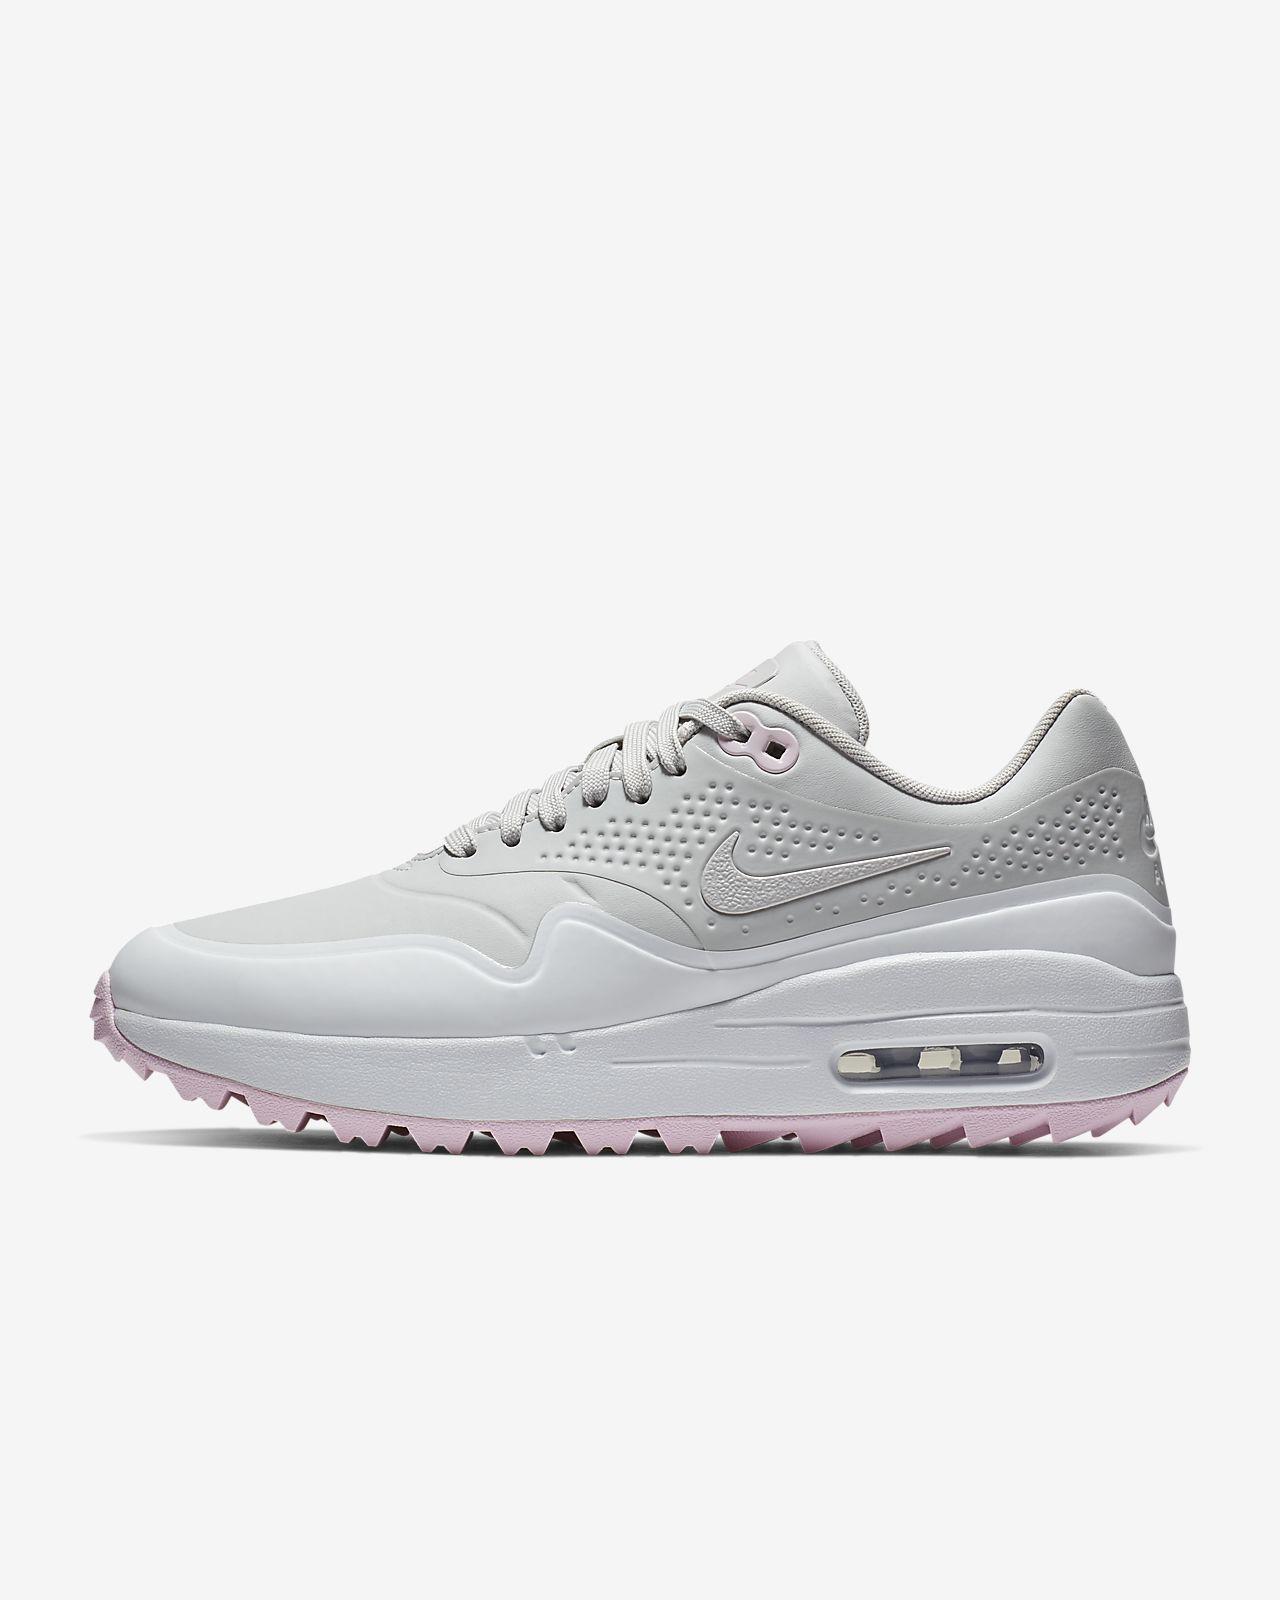 6c22be95350d Nike Air Max 1 G Women s Golf Shoe. Nike.com PT